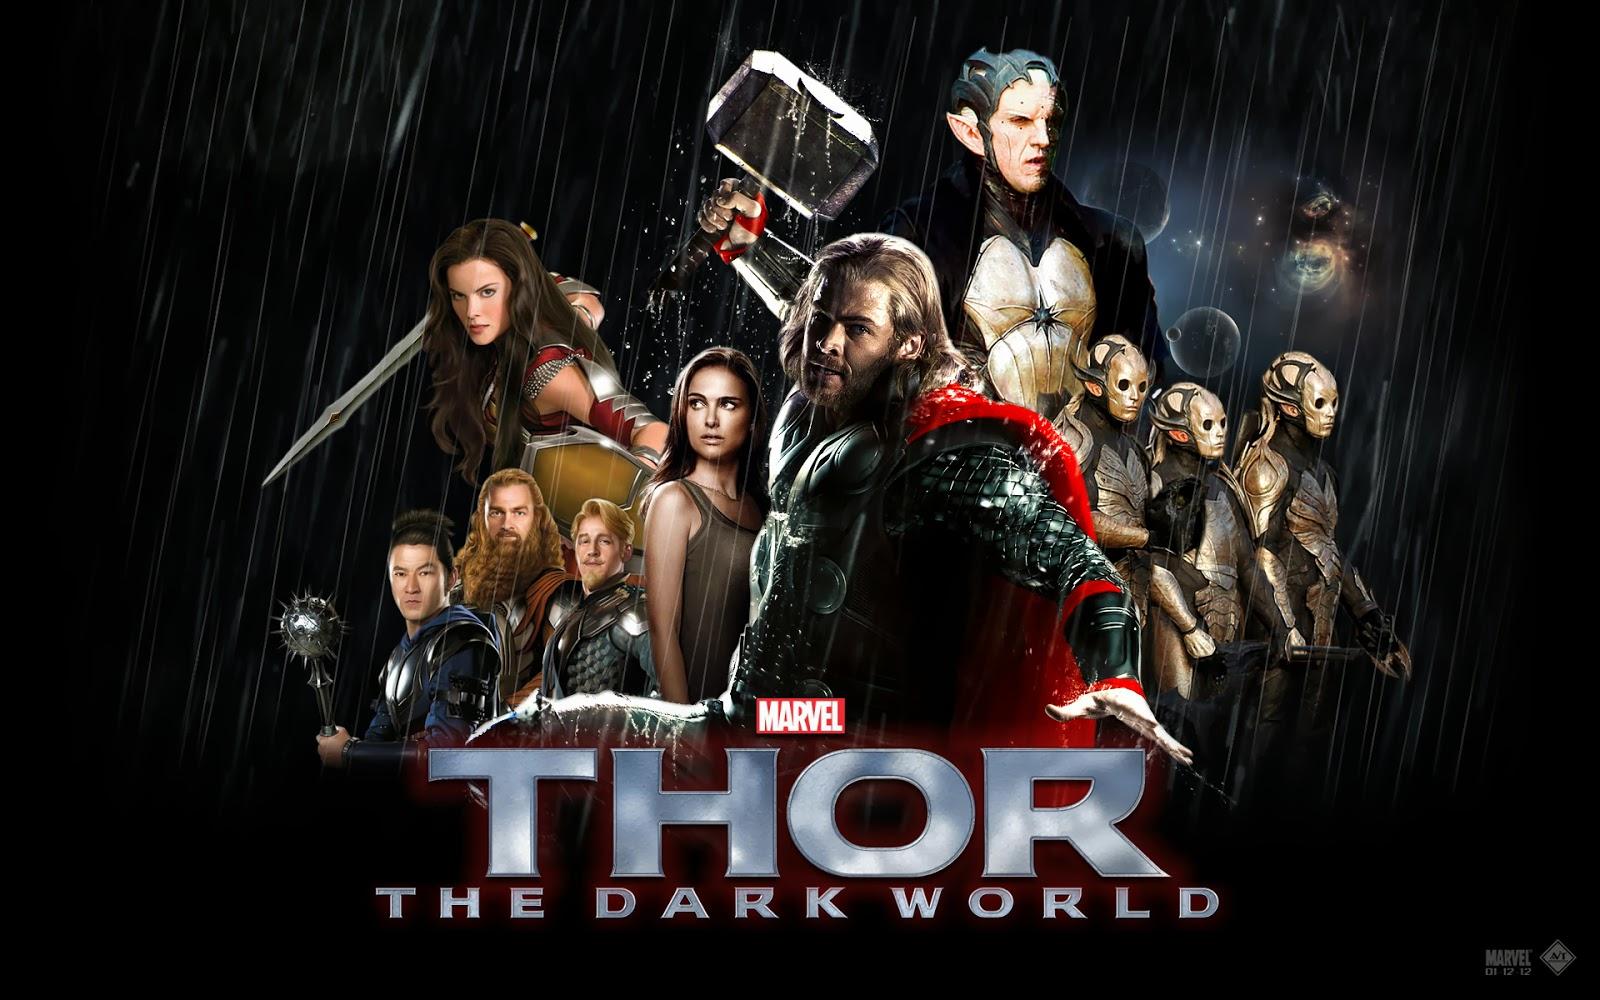 free download hd movies: free download thor: the dark world movie hd